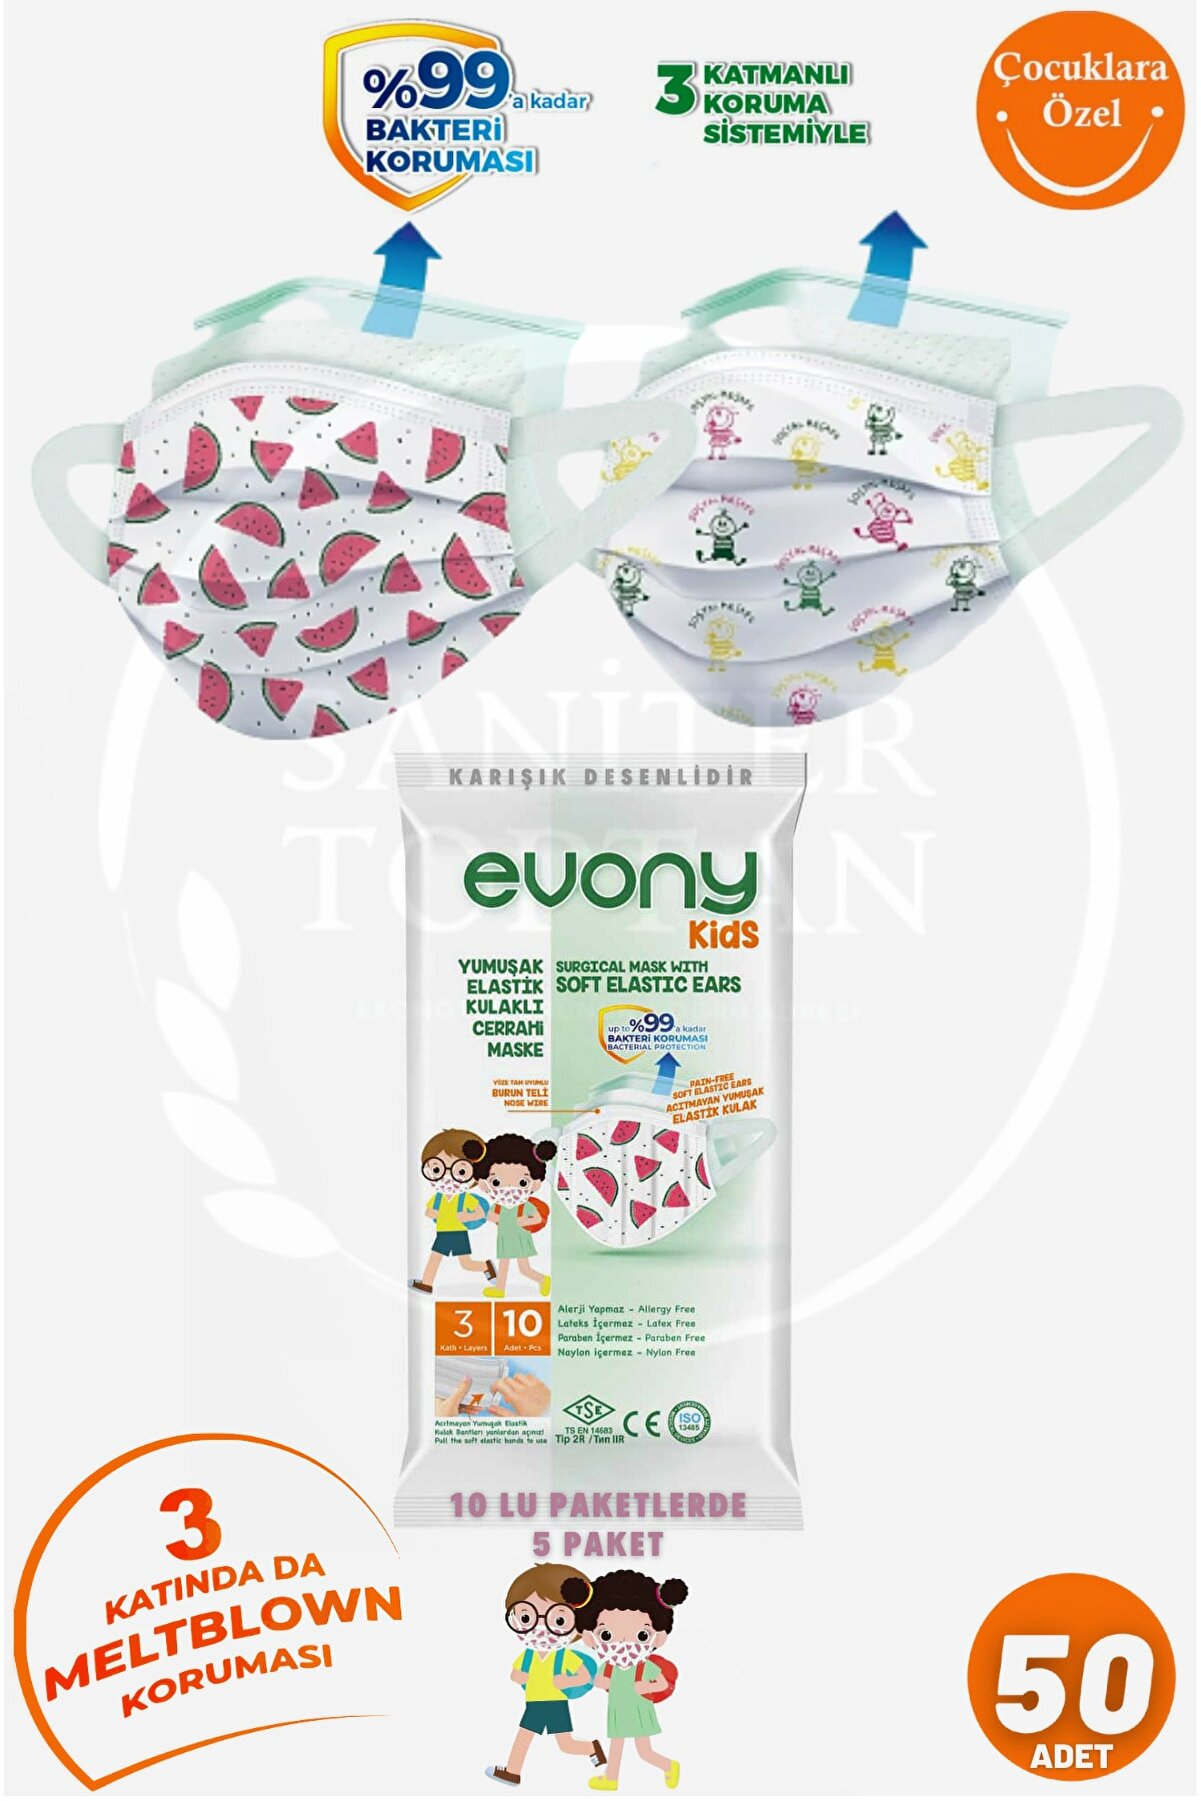 Evony Kids Cerrahi Maske 10 Lu 5 Paket = 50 Adet